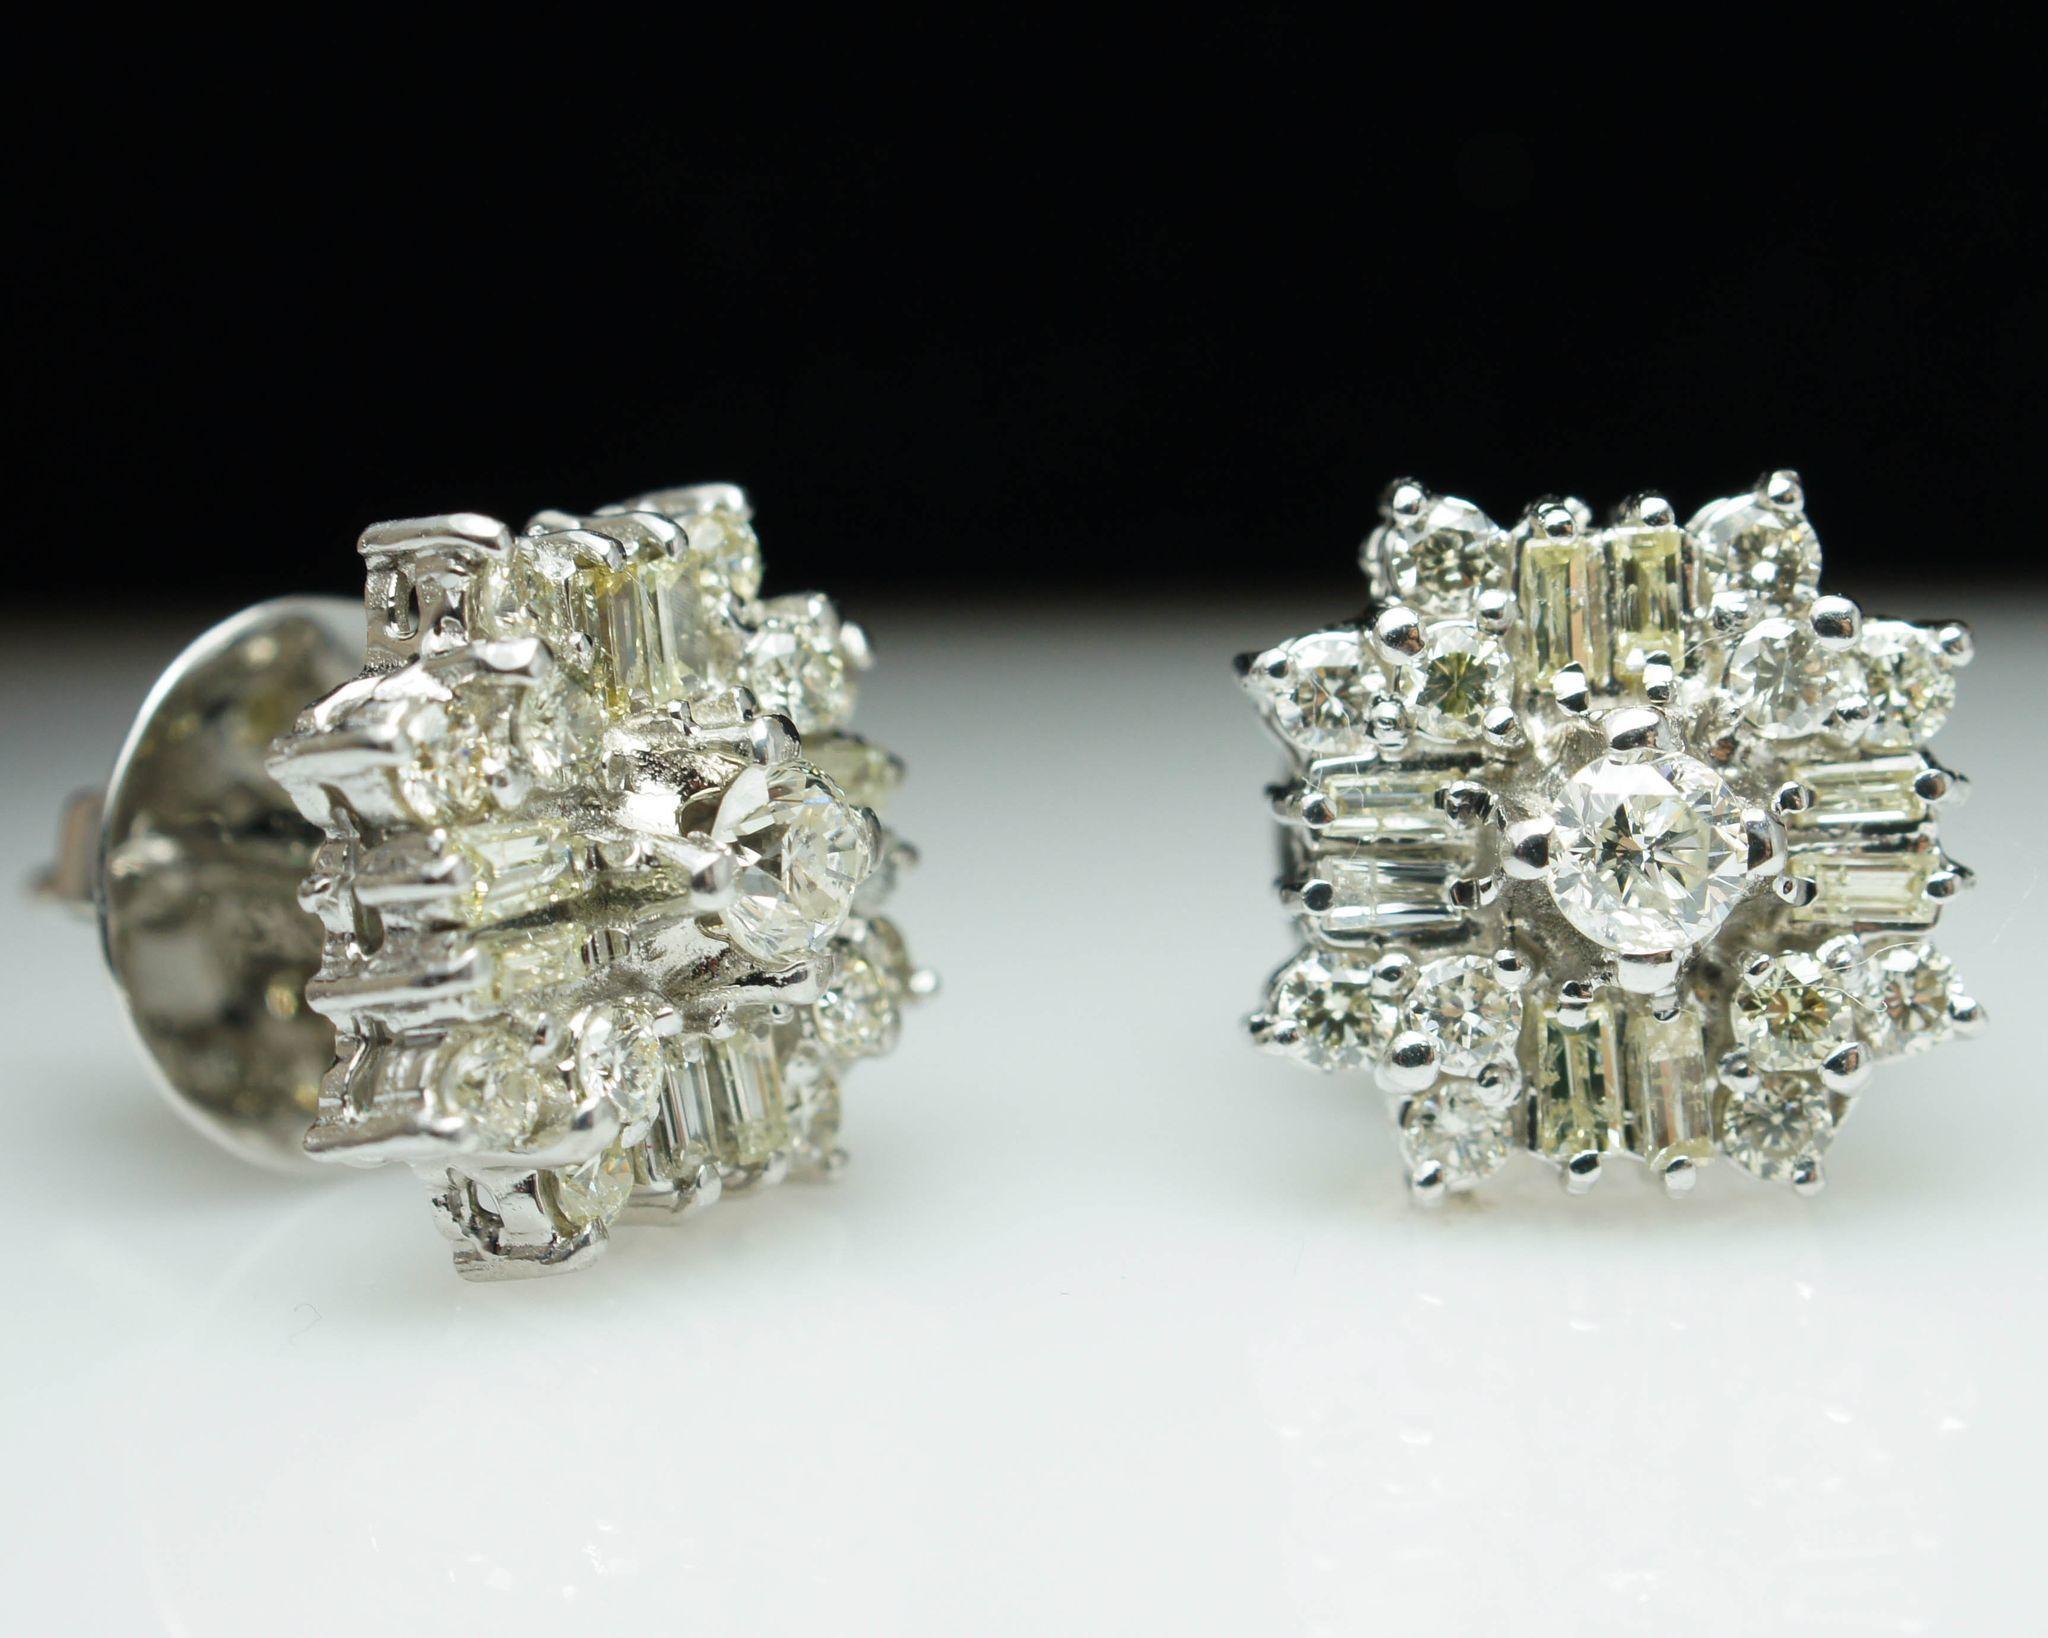 Vintage Round Baguette Cut Diamond Stud Earrings 1 49ctw 14k White